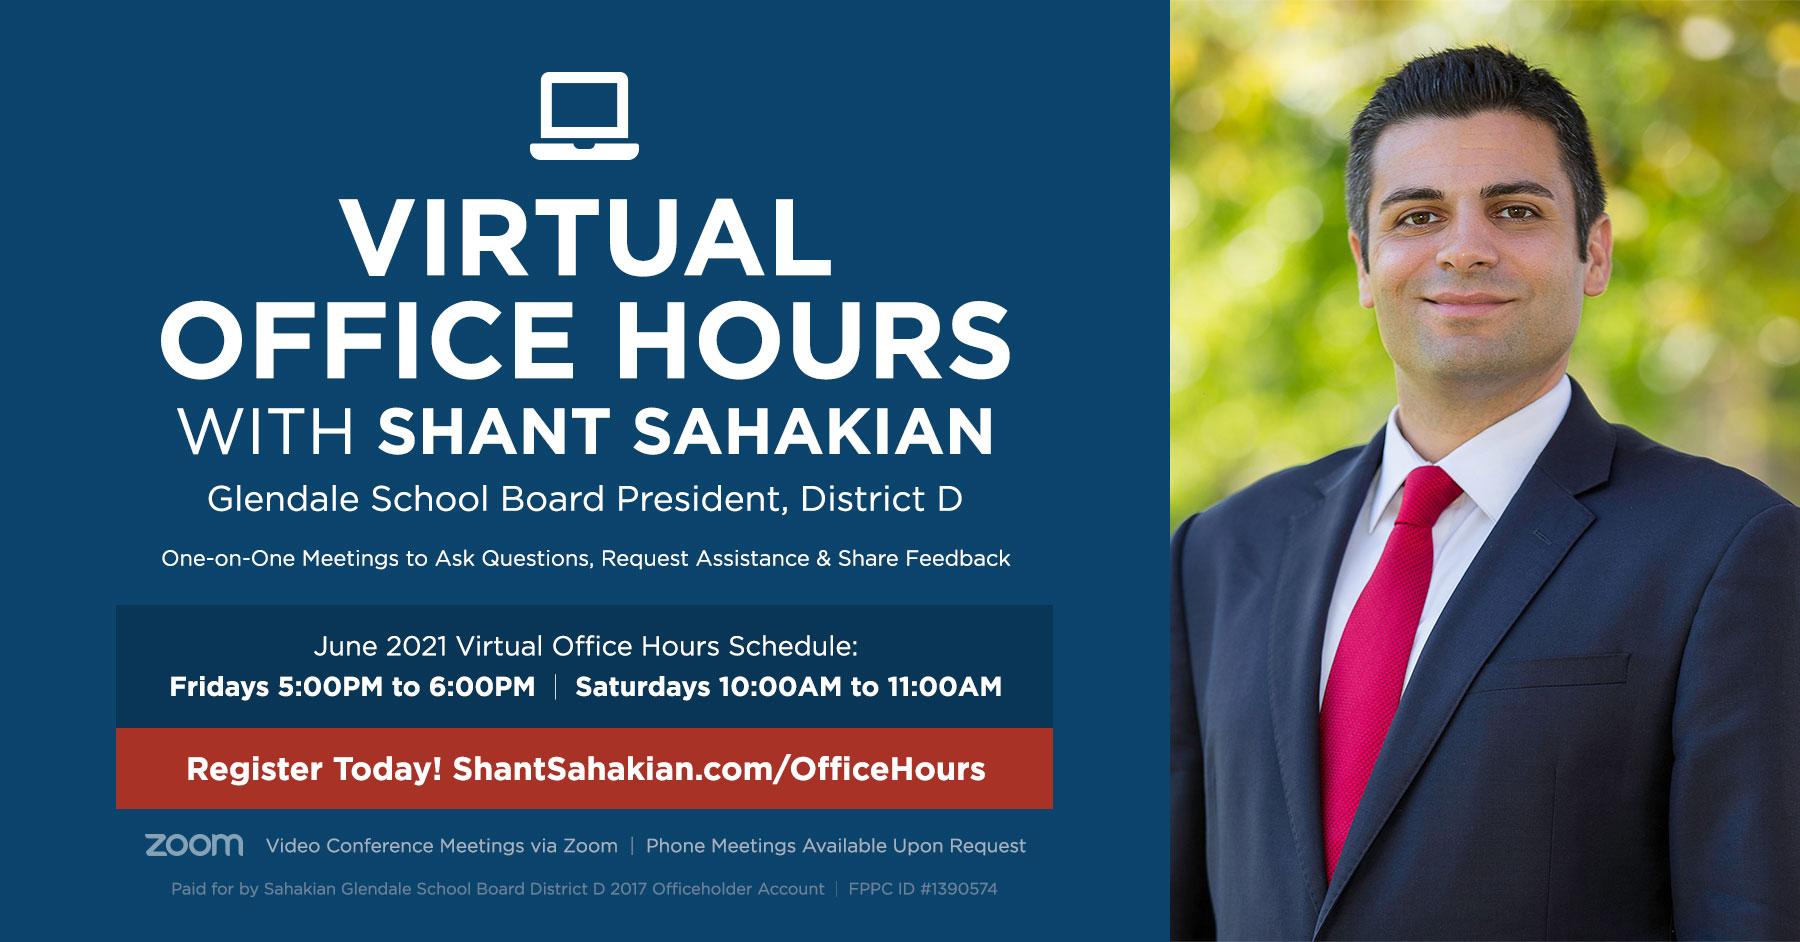 Virtual Office Hours with Glendale School Board President Shant Sahakian June 2021